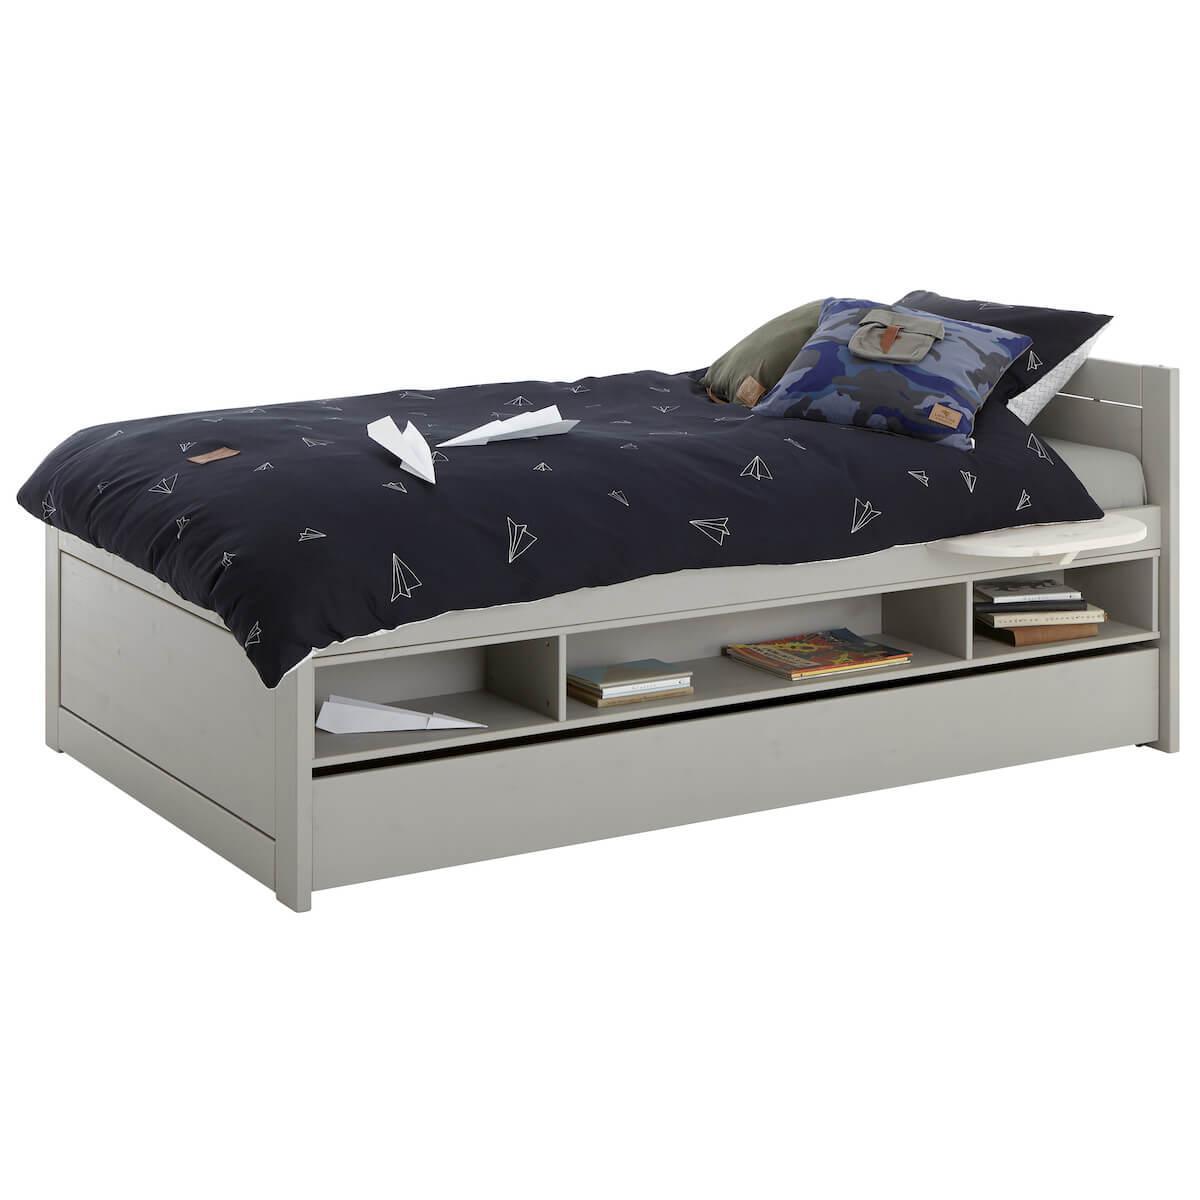 Grand tiroir lit 120x200cm Lifetime gris